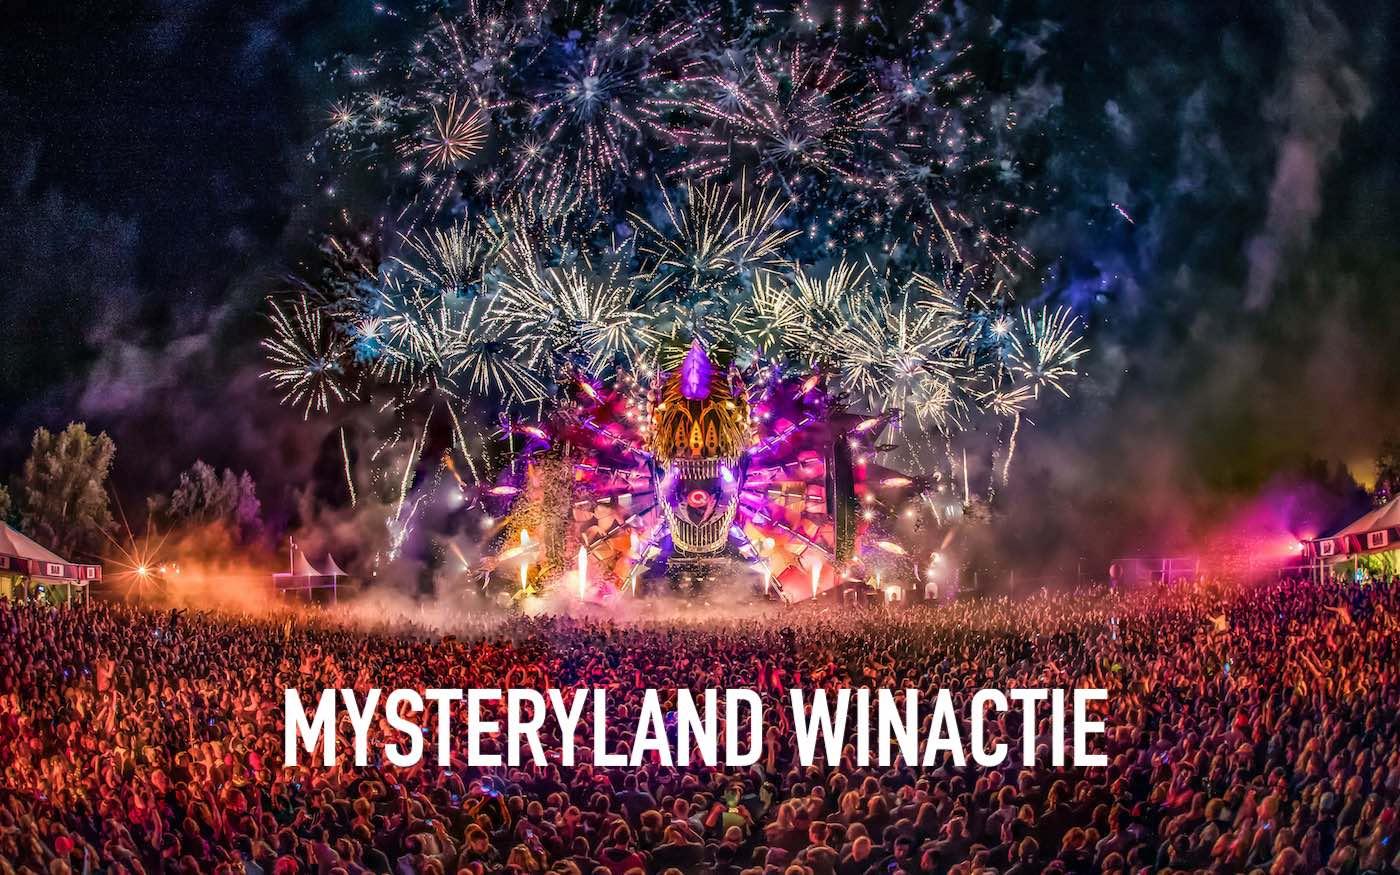 MYSTERLAND FESTIVAL WINACTIE